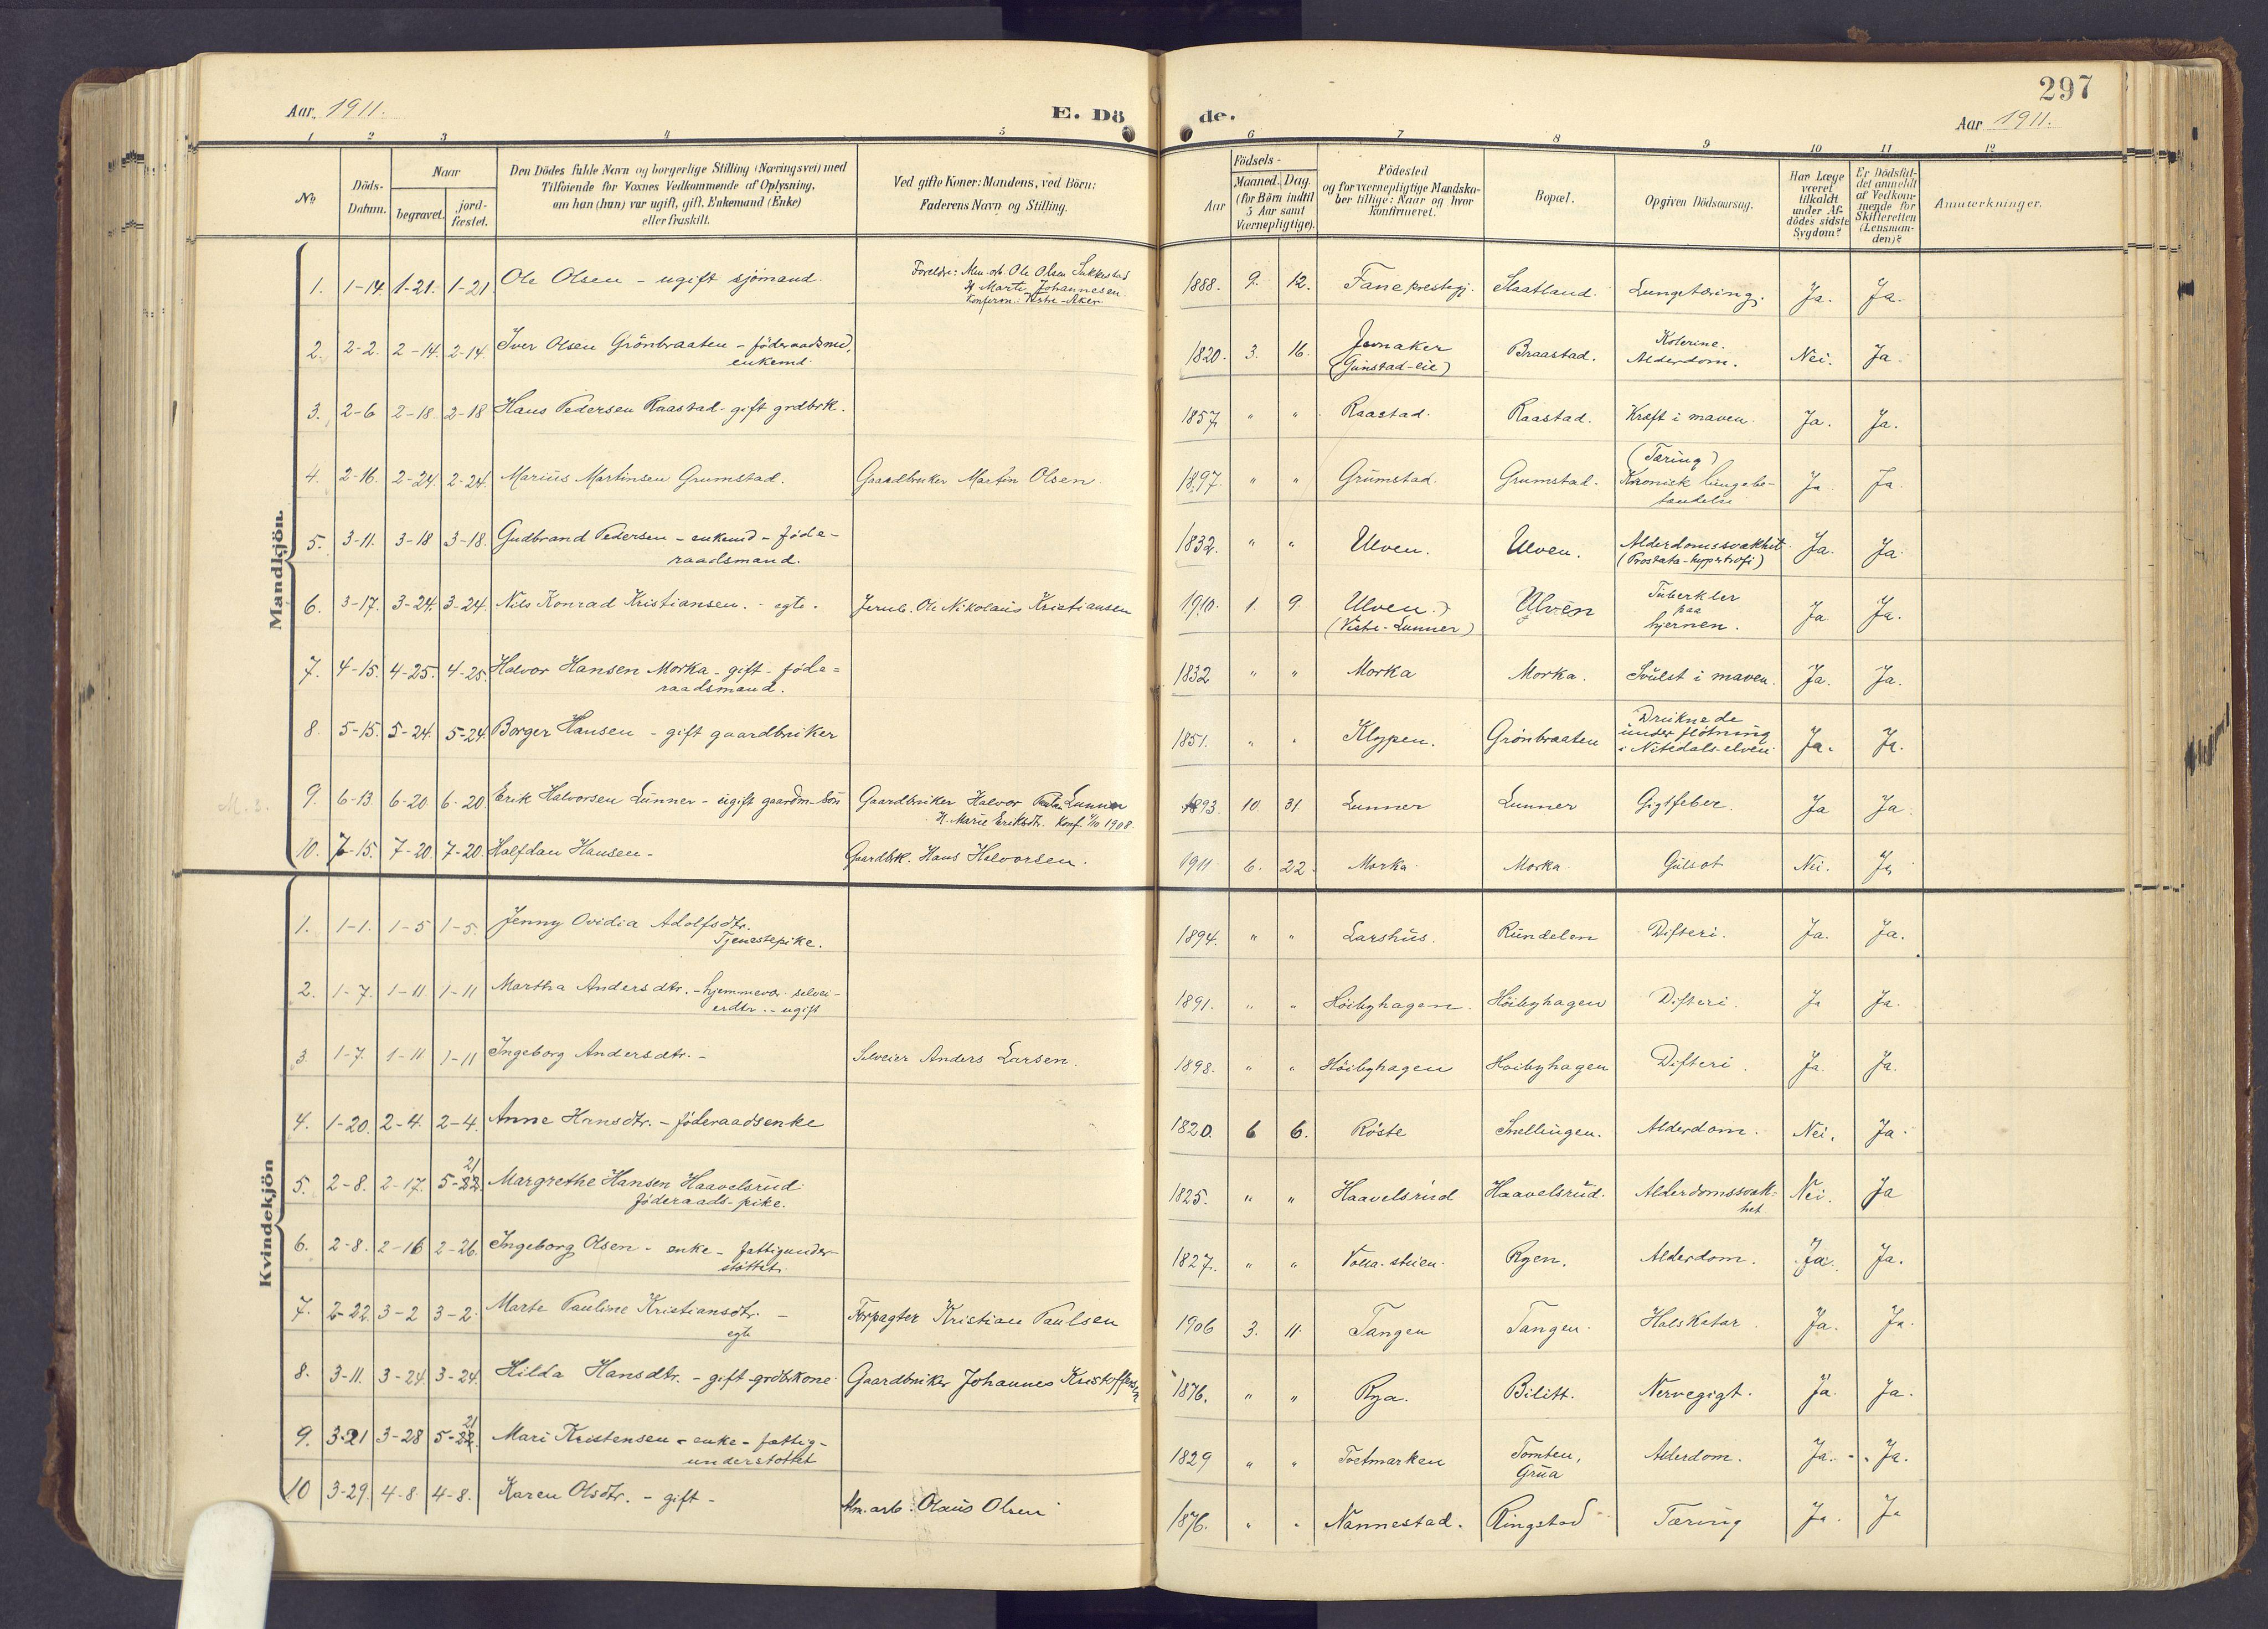 SAH, Lunner prestekontor, H/Ha/Haa/L0001: Ministerialbok nr. 1, 1907-1922, s. 297